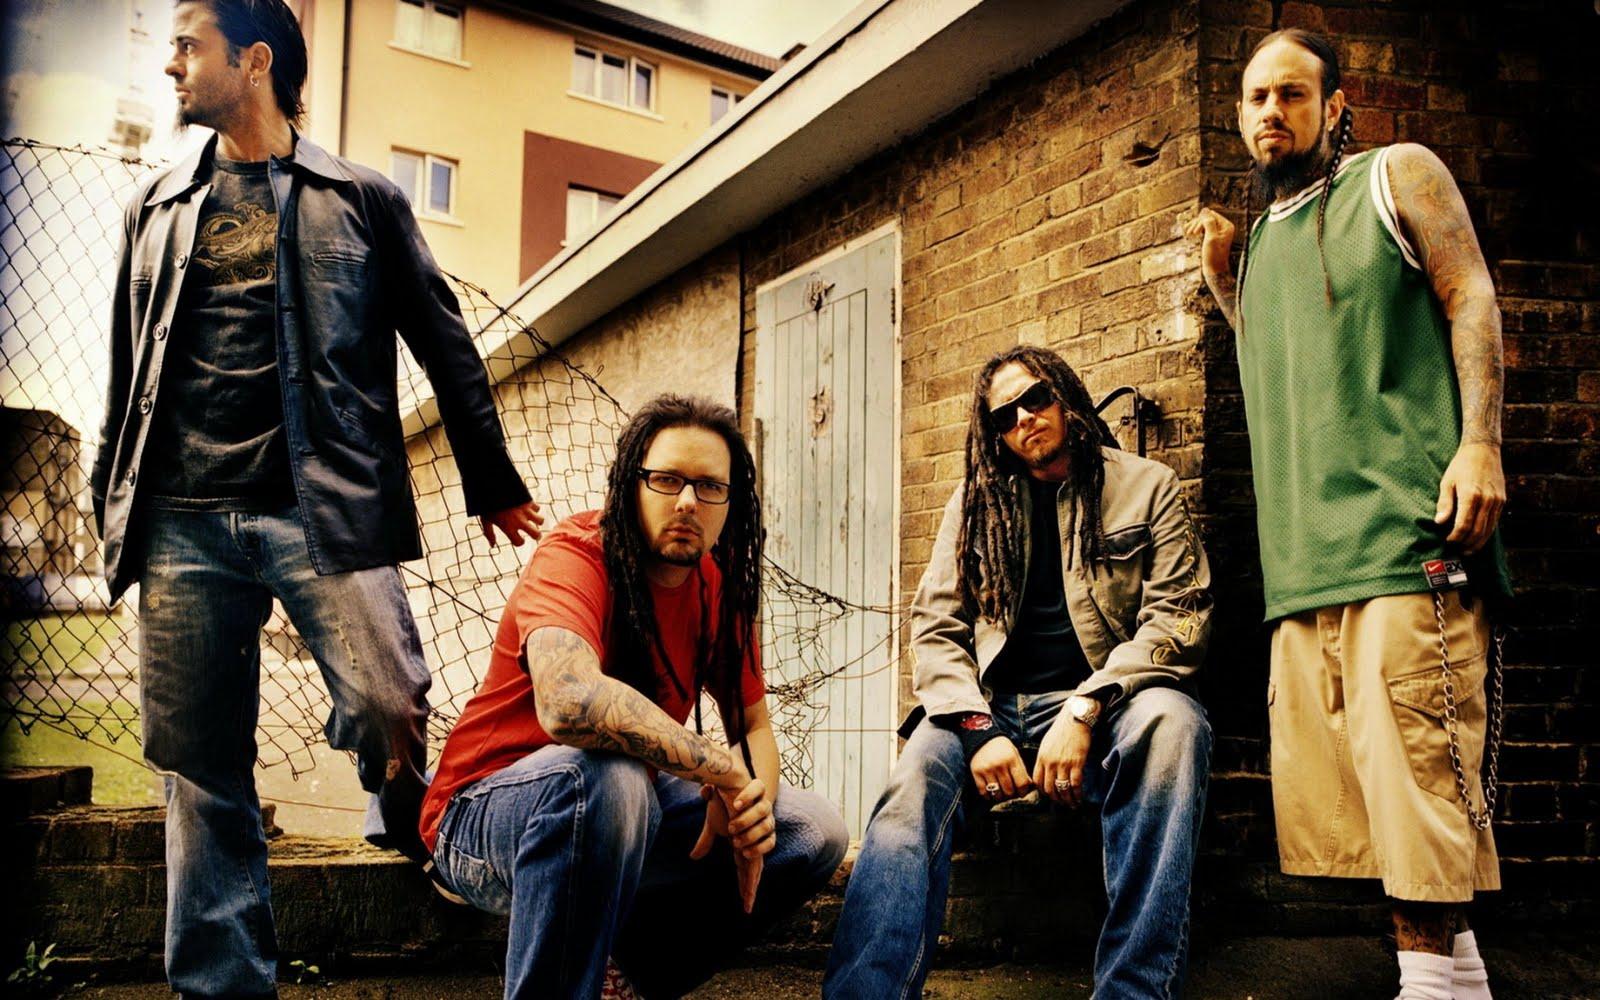 http://1.bp.blogspot.com/-HS39Q9HkjkI/Tldn085EpsI/AAAAAAAABqo/I6gPOBx300g/s1600/Korn-Group-Music-2.jpg